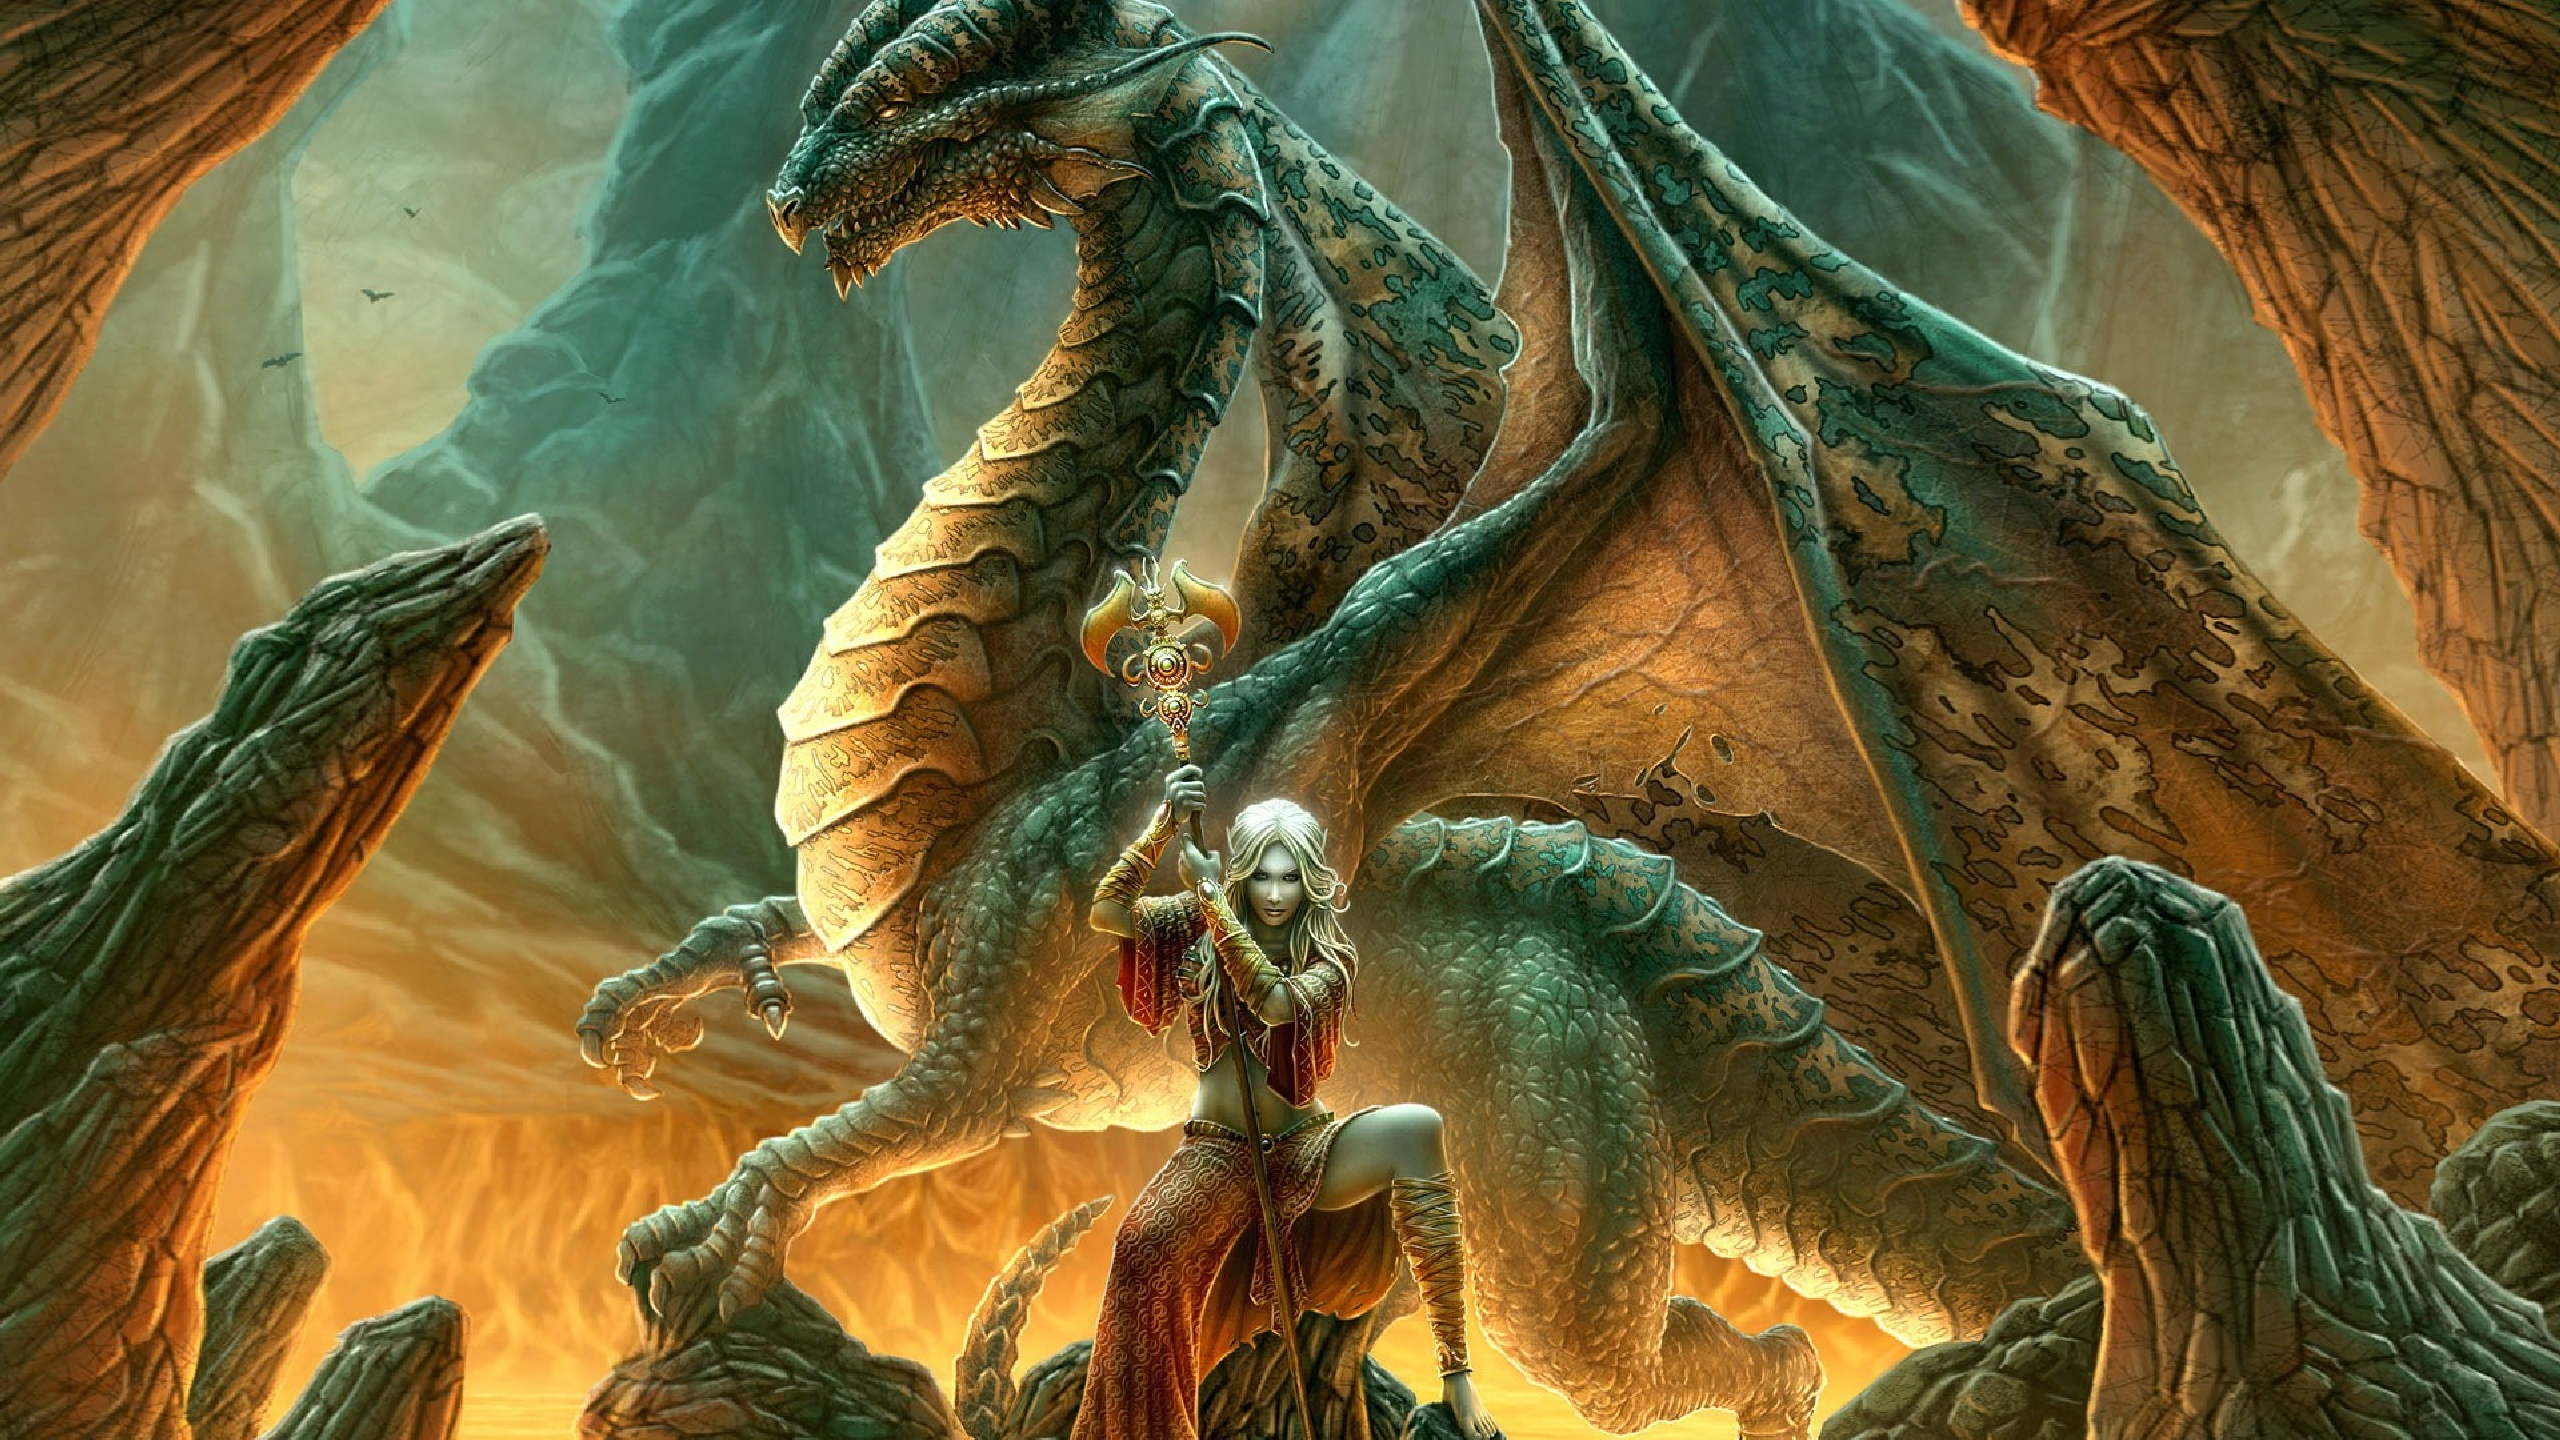 Dragon Hd Wallpaper Background Image 2560x1440 Id